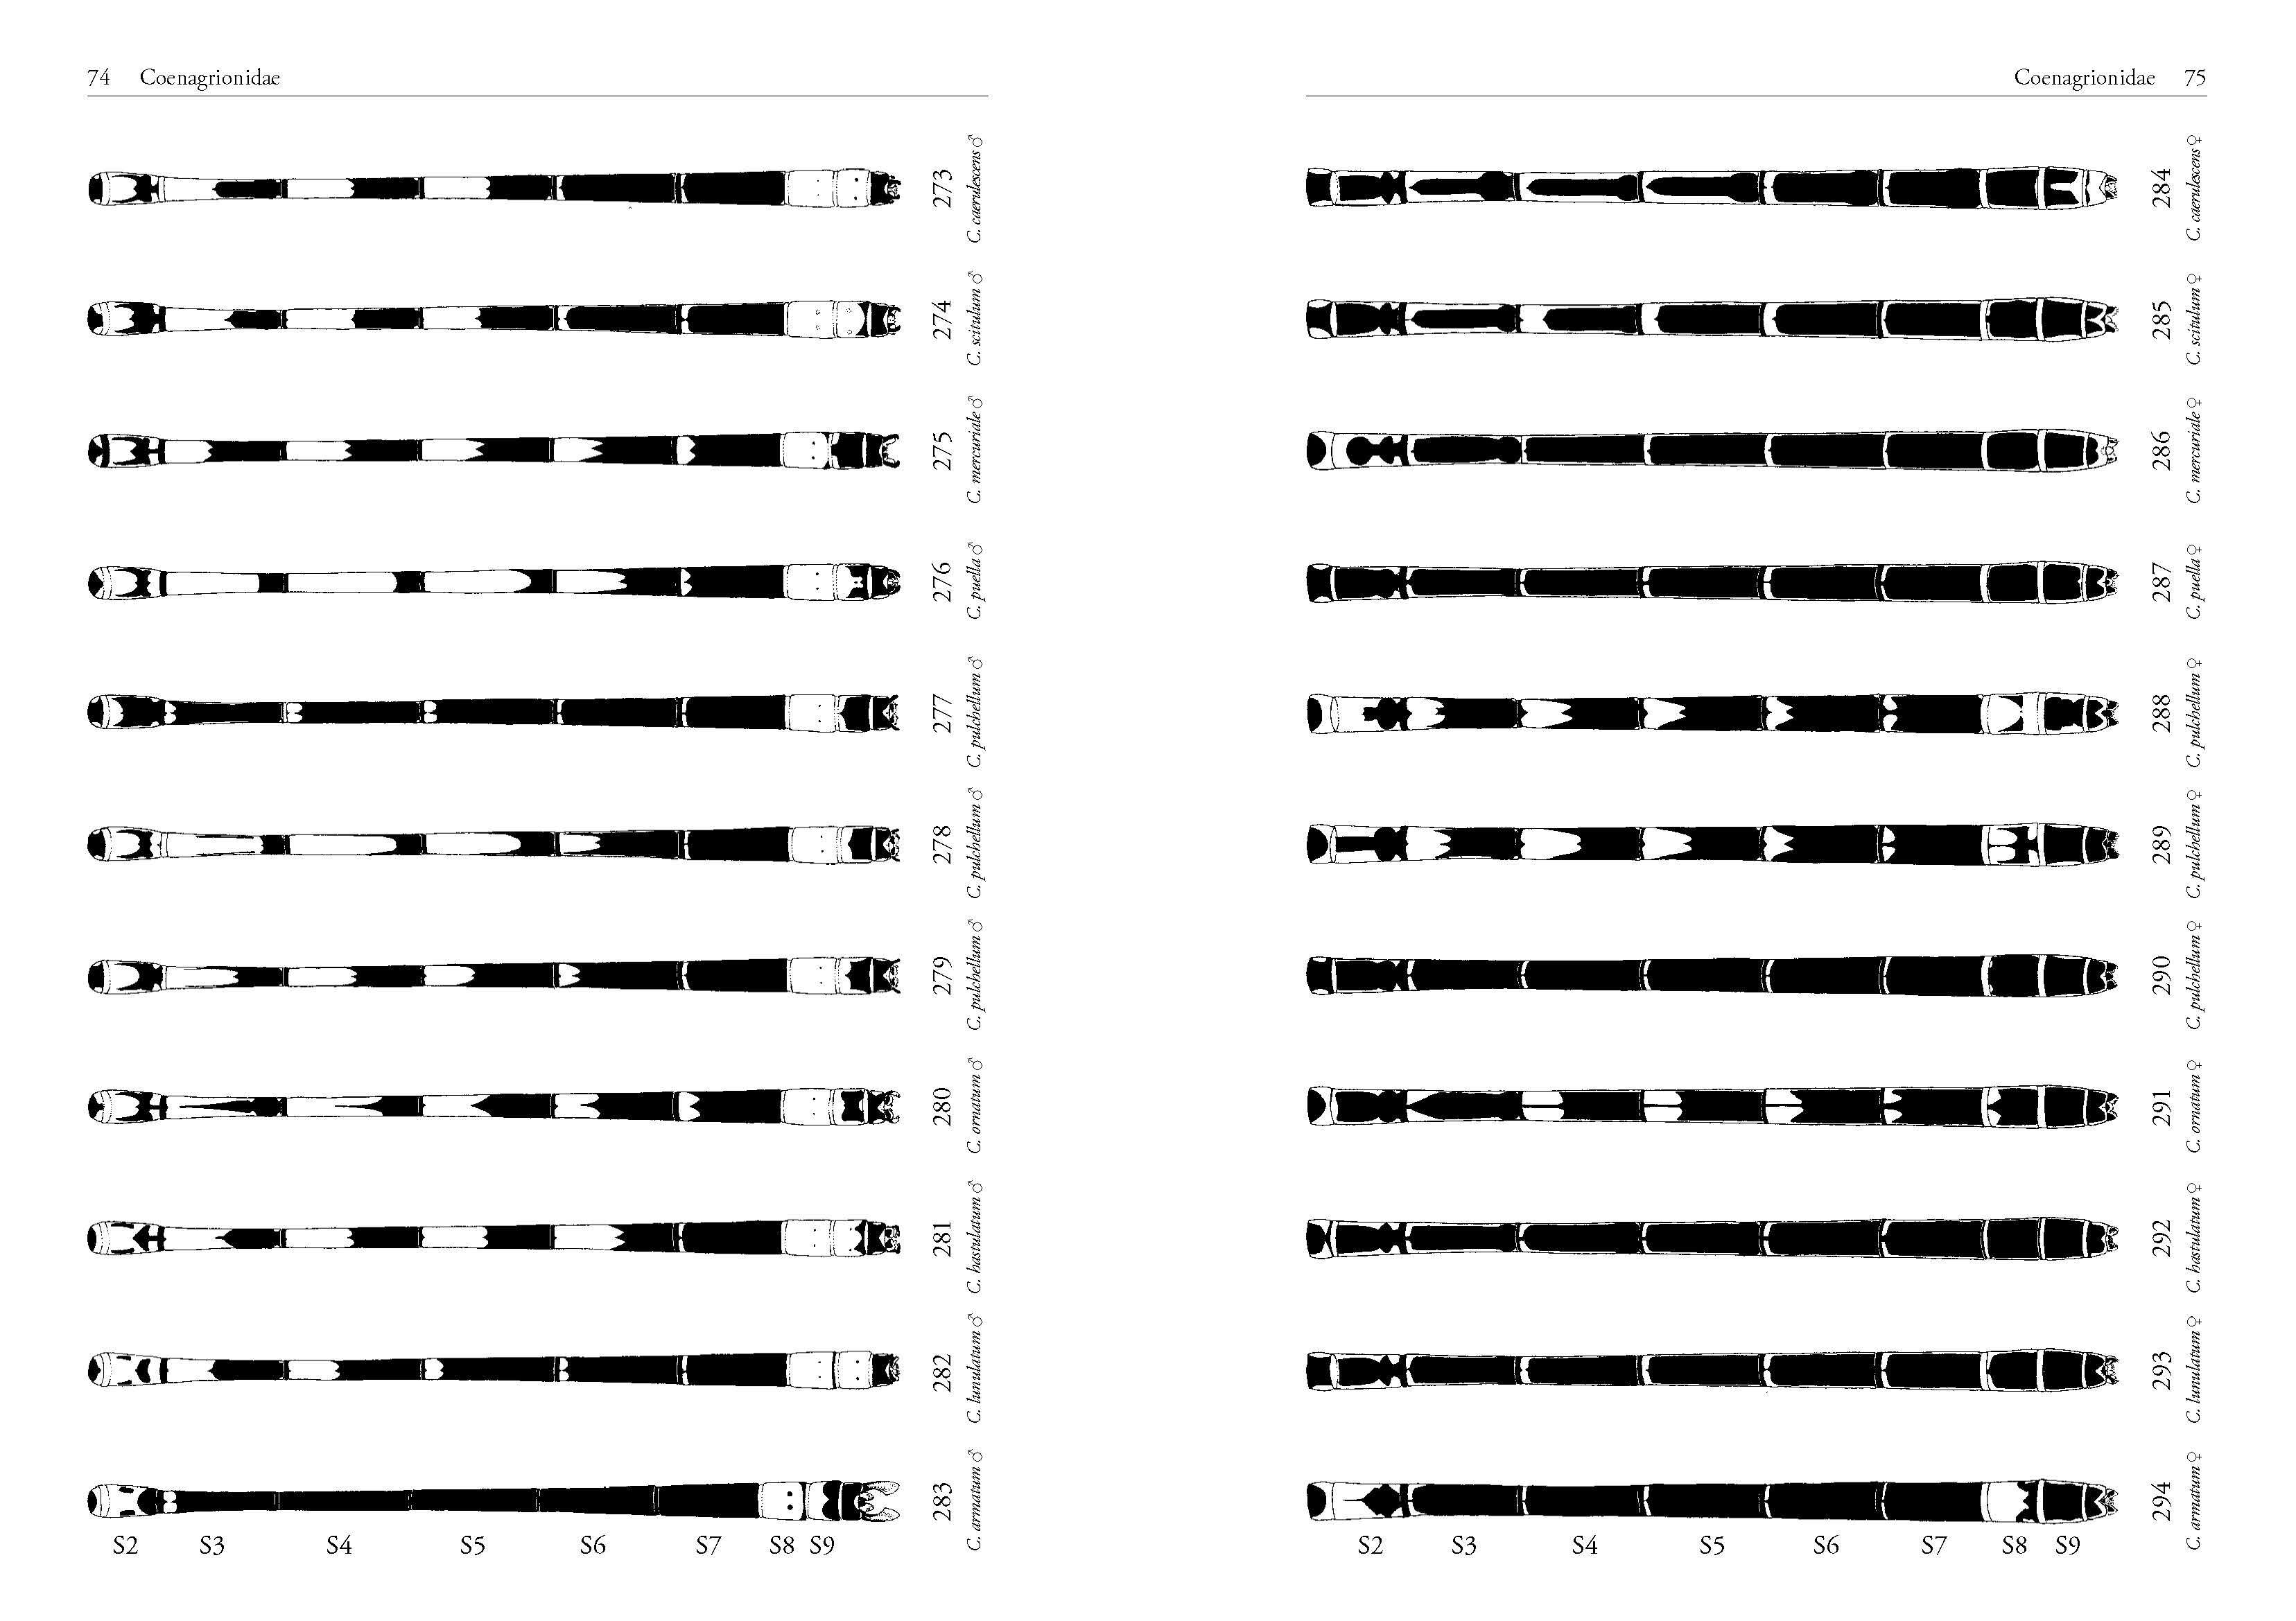 Leseprobe - DJN Libellen-Bestimmungsschlüssel Lehmann/Nüß, Seite 74/75